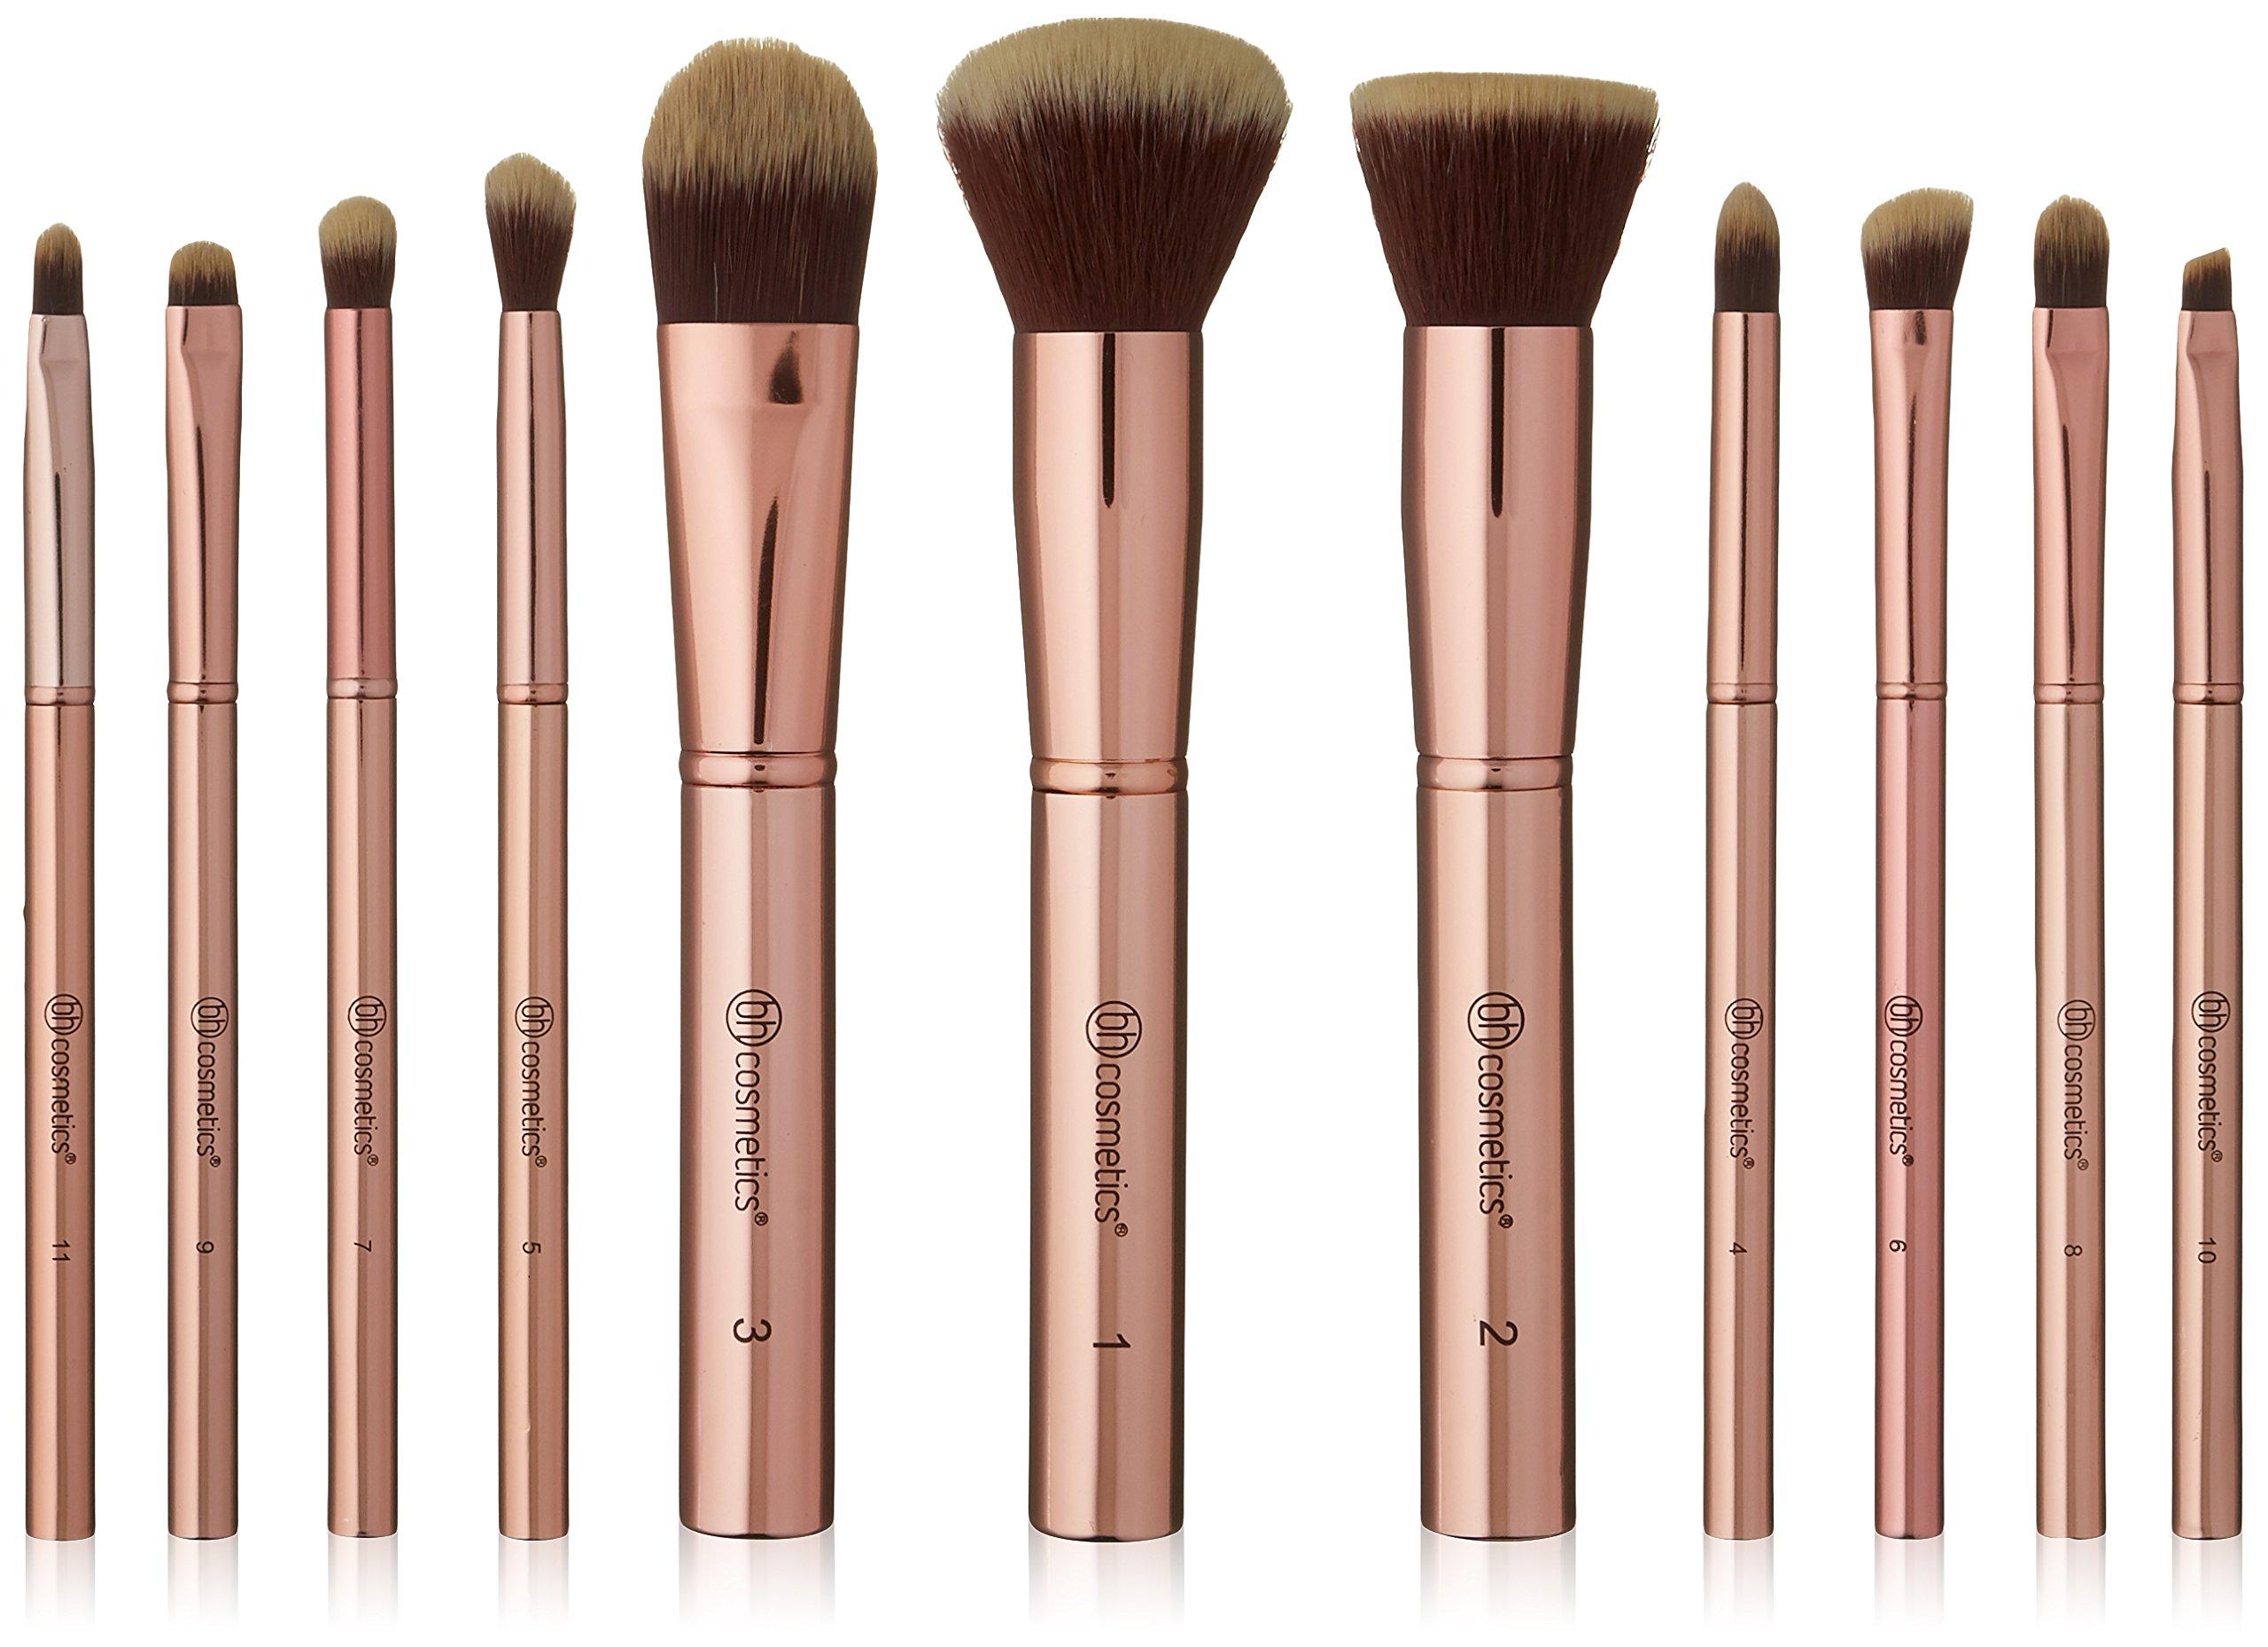 dae7605f17df6 Amazon.com  Pink-A-Dot - 11 Piece Brush Set  Beauty